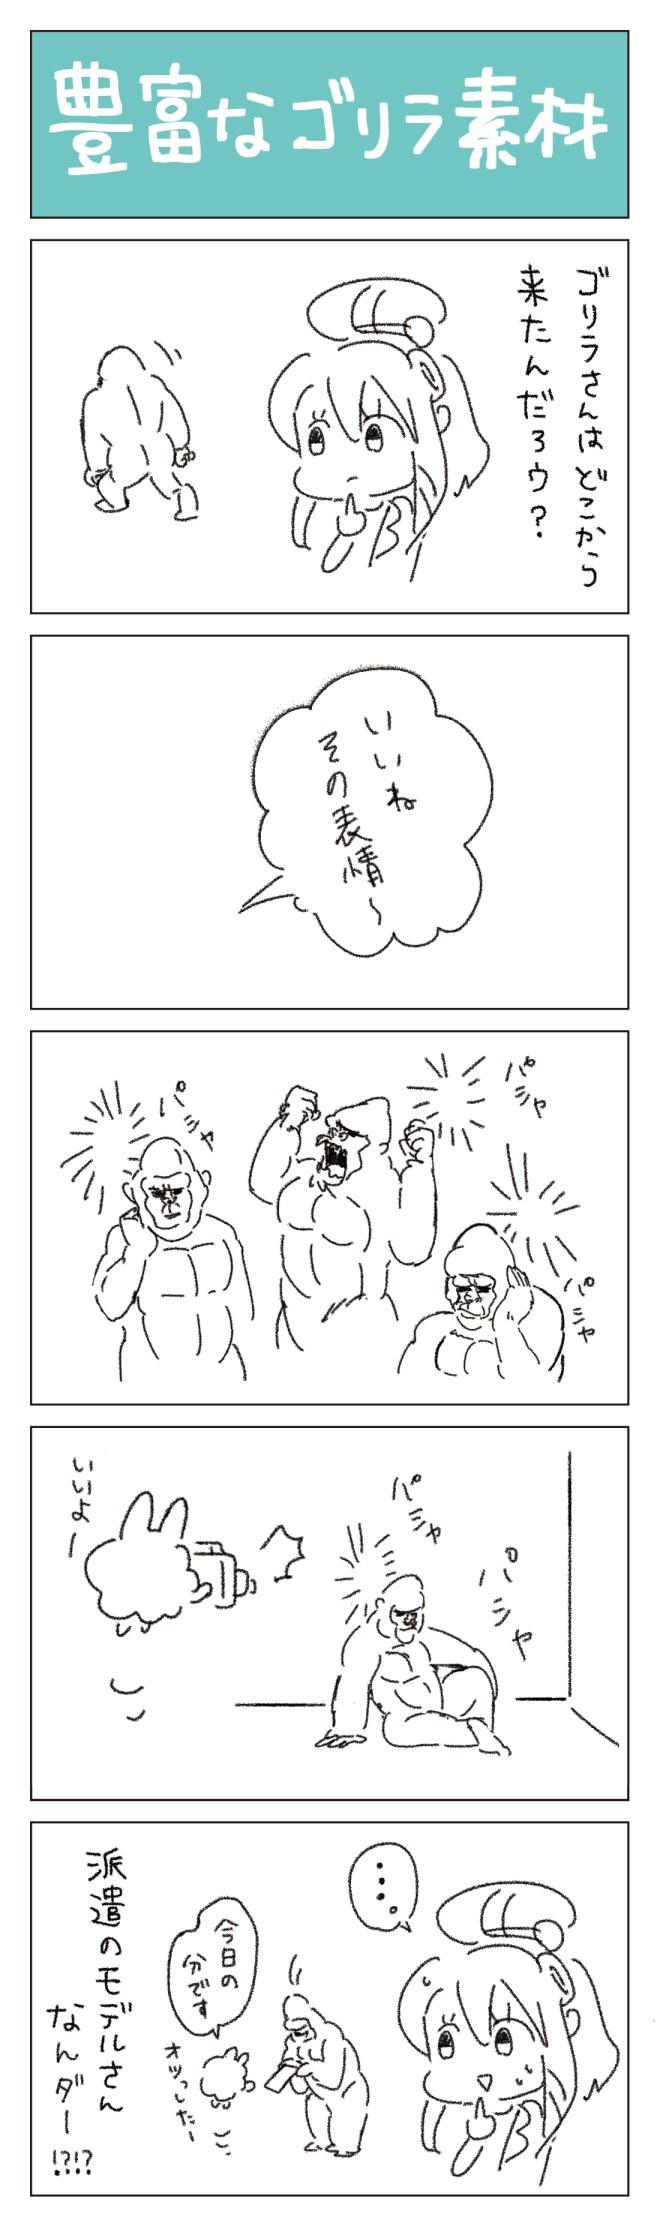 sozakou_manga02